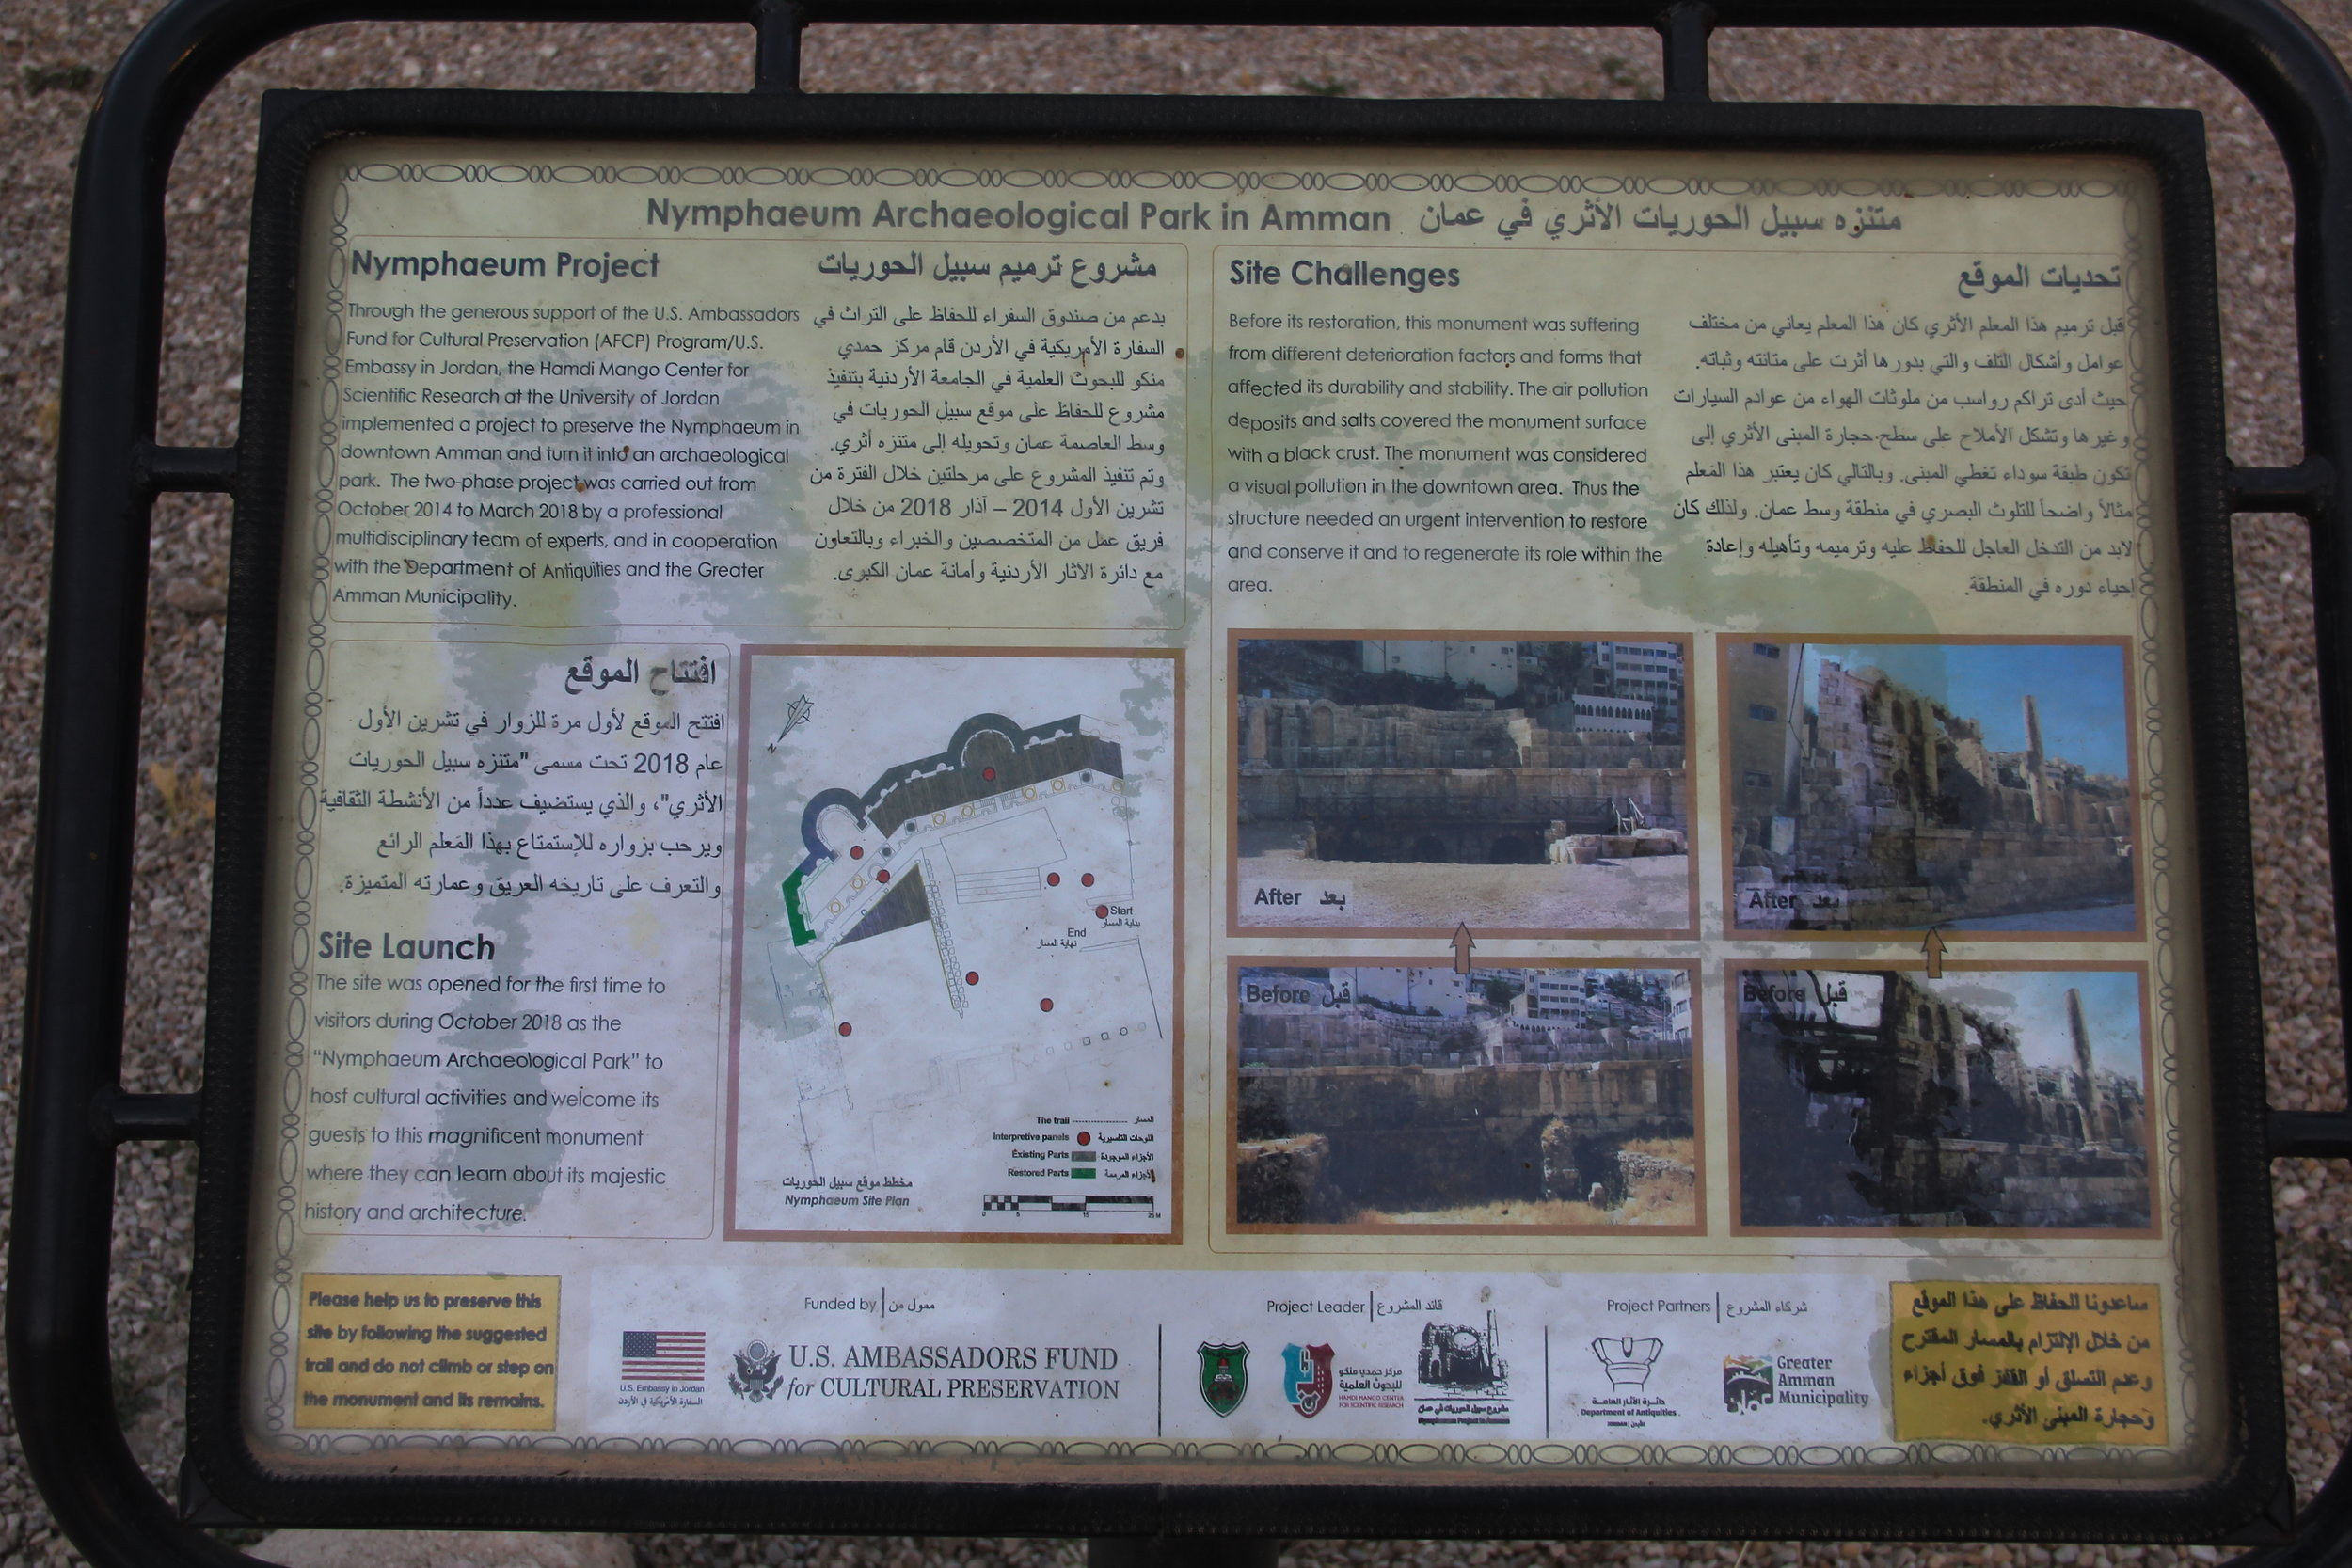 mingmingfeng-jordan-amman-nymphaeum-archaeological-park-03.JPG